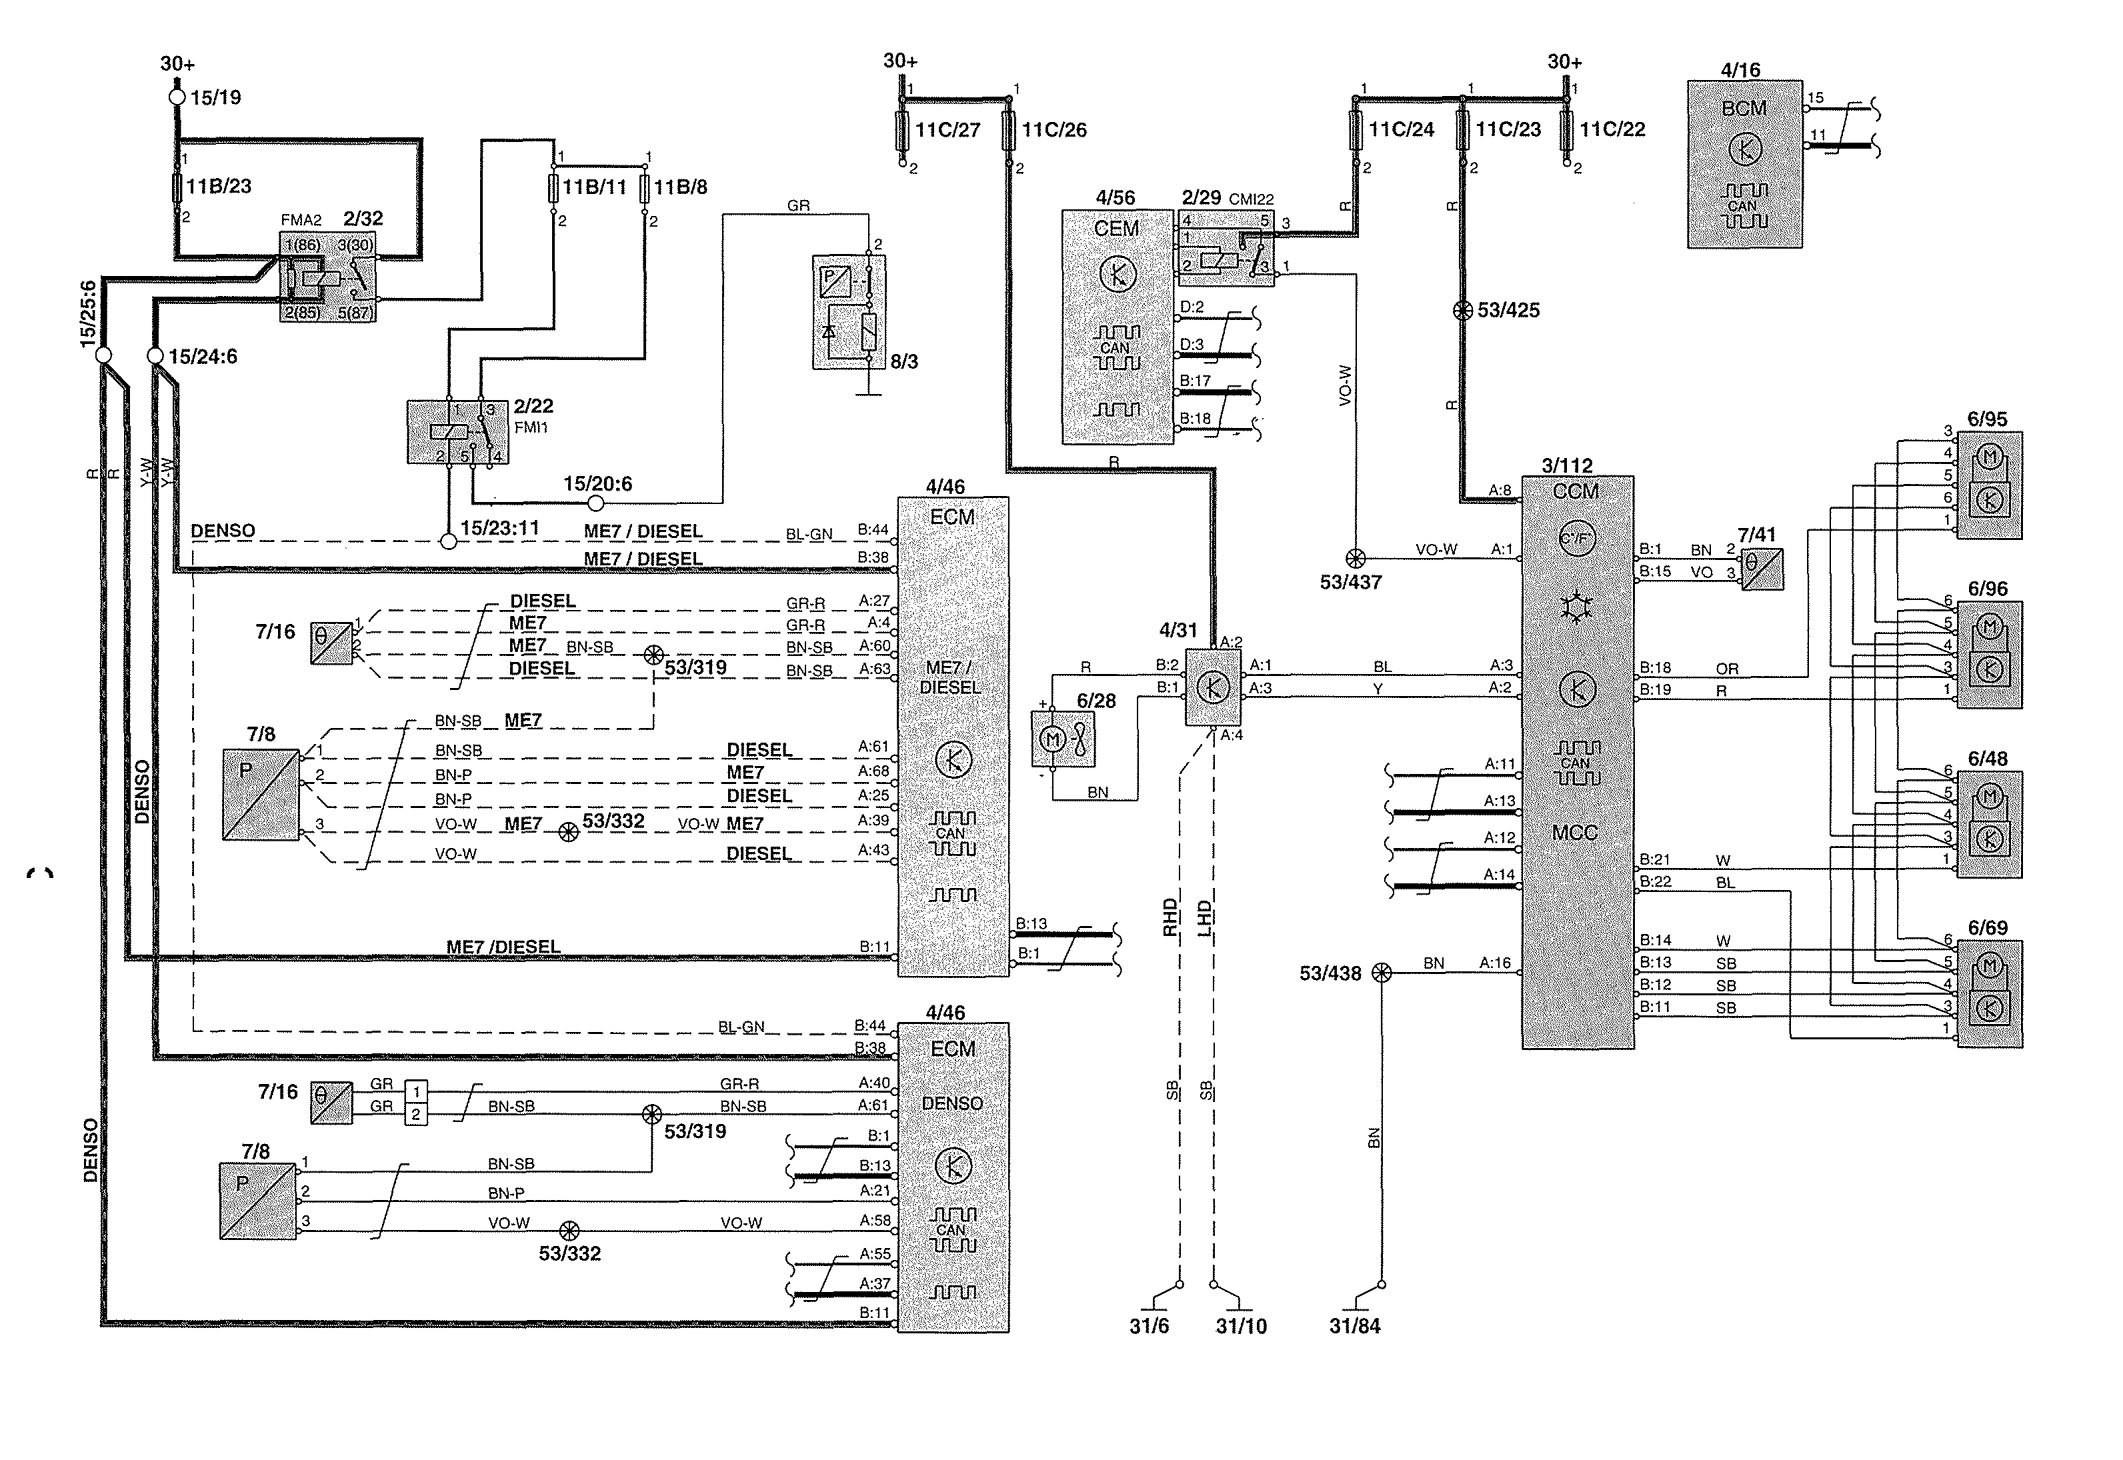 Volvo S80 2000 Wiring Diagram Diagram] Volvo Wiring Diagram Xc70 Full Version Hd Quality Of Volvo S80 2000 Wiring Diagram